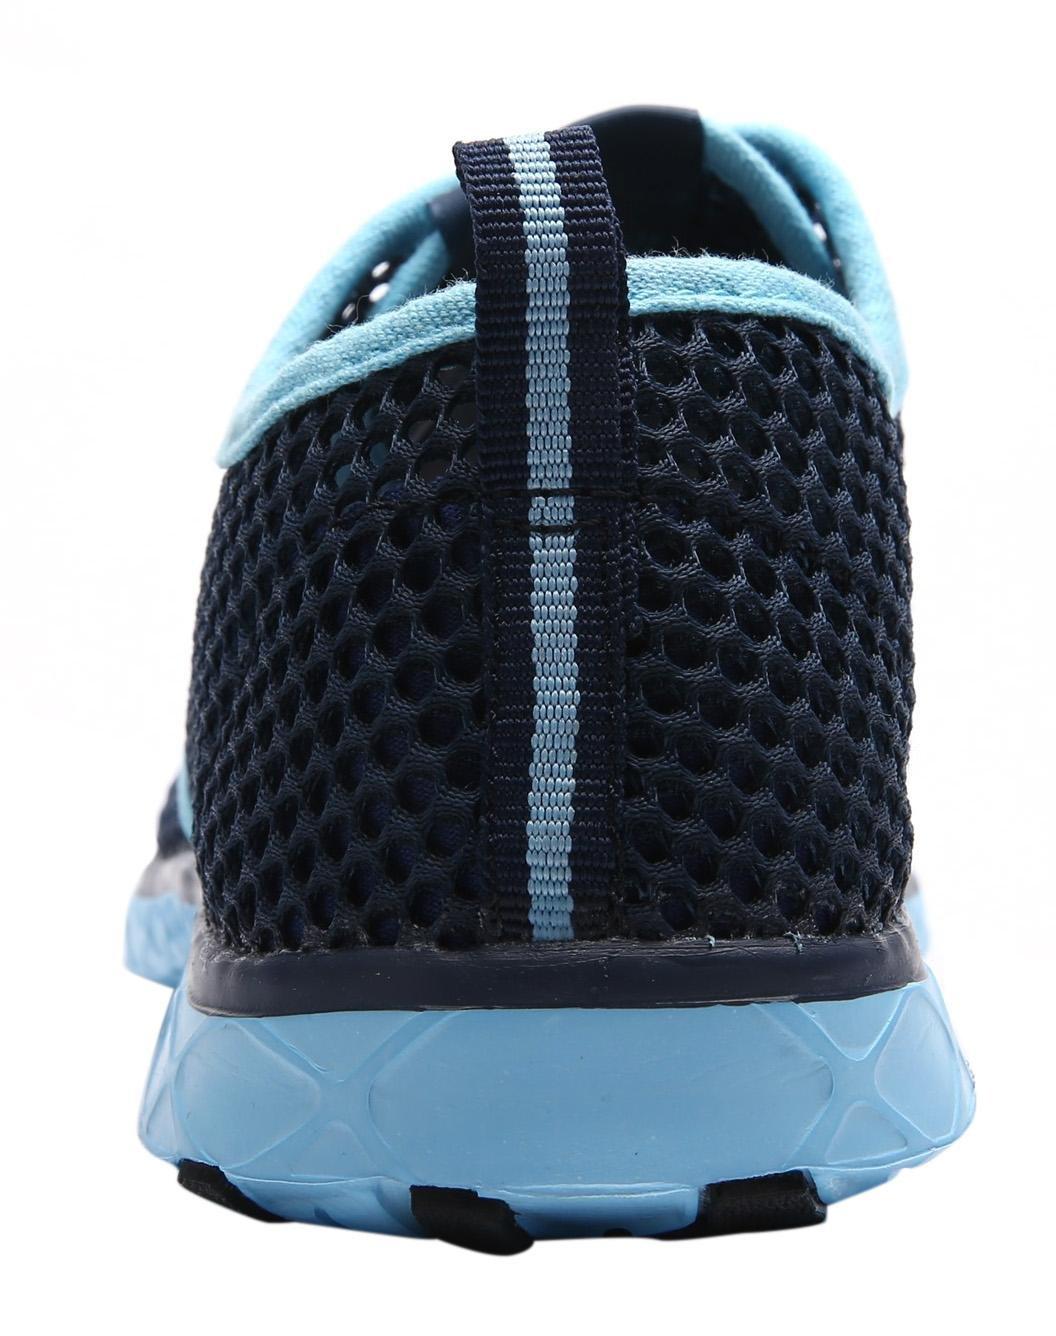 CAIHEE Women's Mesh Lightweight Quick-Dry Aqua Slip On Water Shoes B071H9HK1B 8 B(M) US|Blue